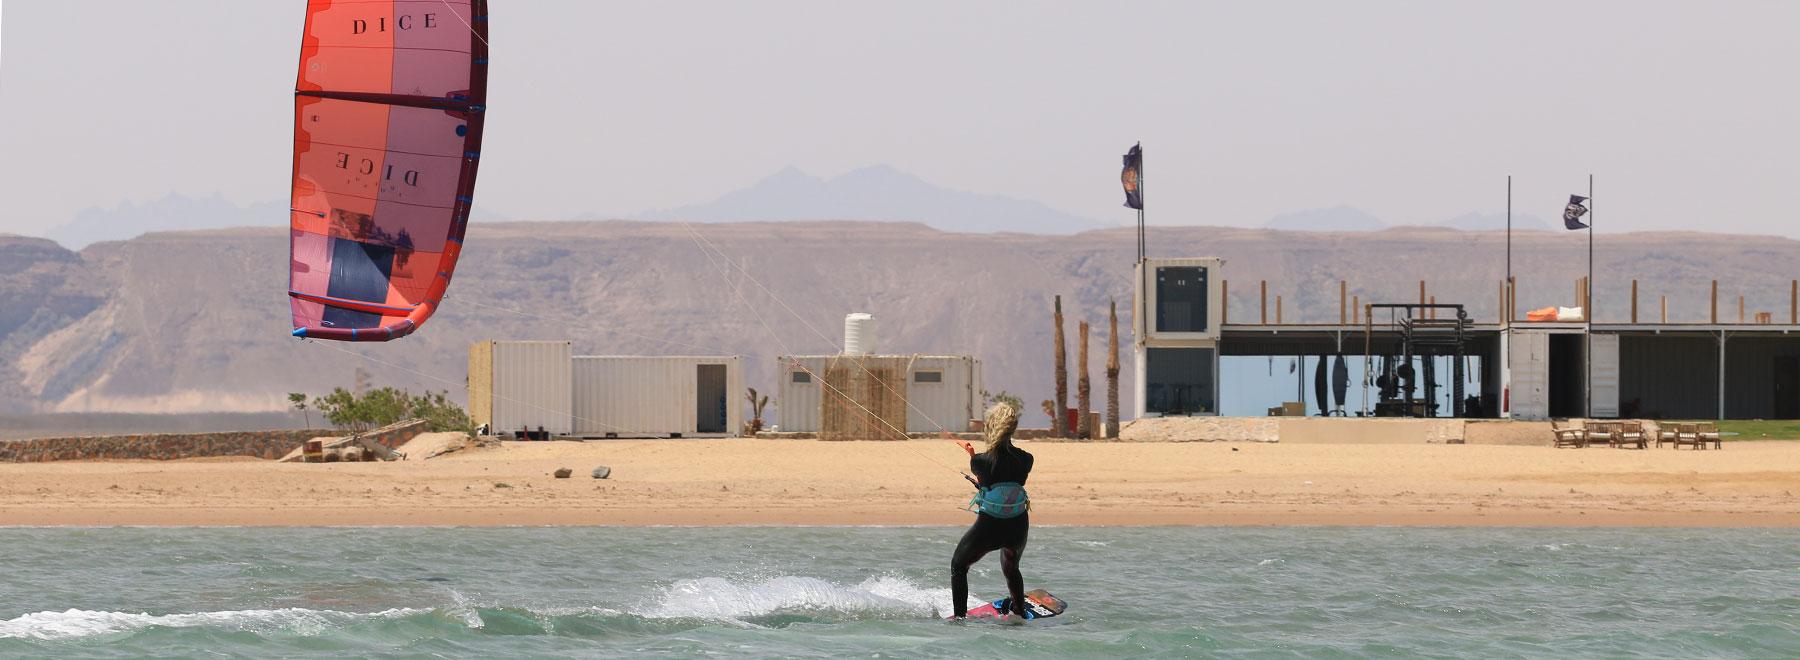 Kiteboarding-Events Kitesurfen in El-Gouna mit KiteWorldWide